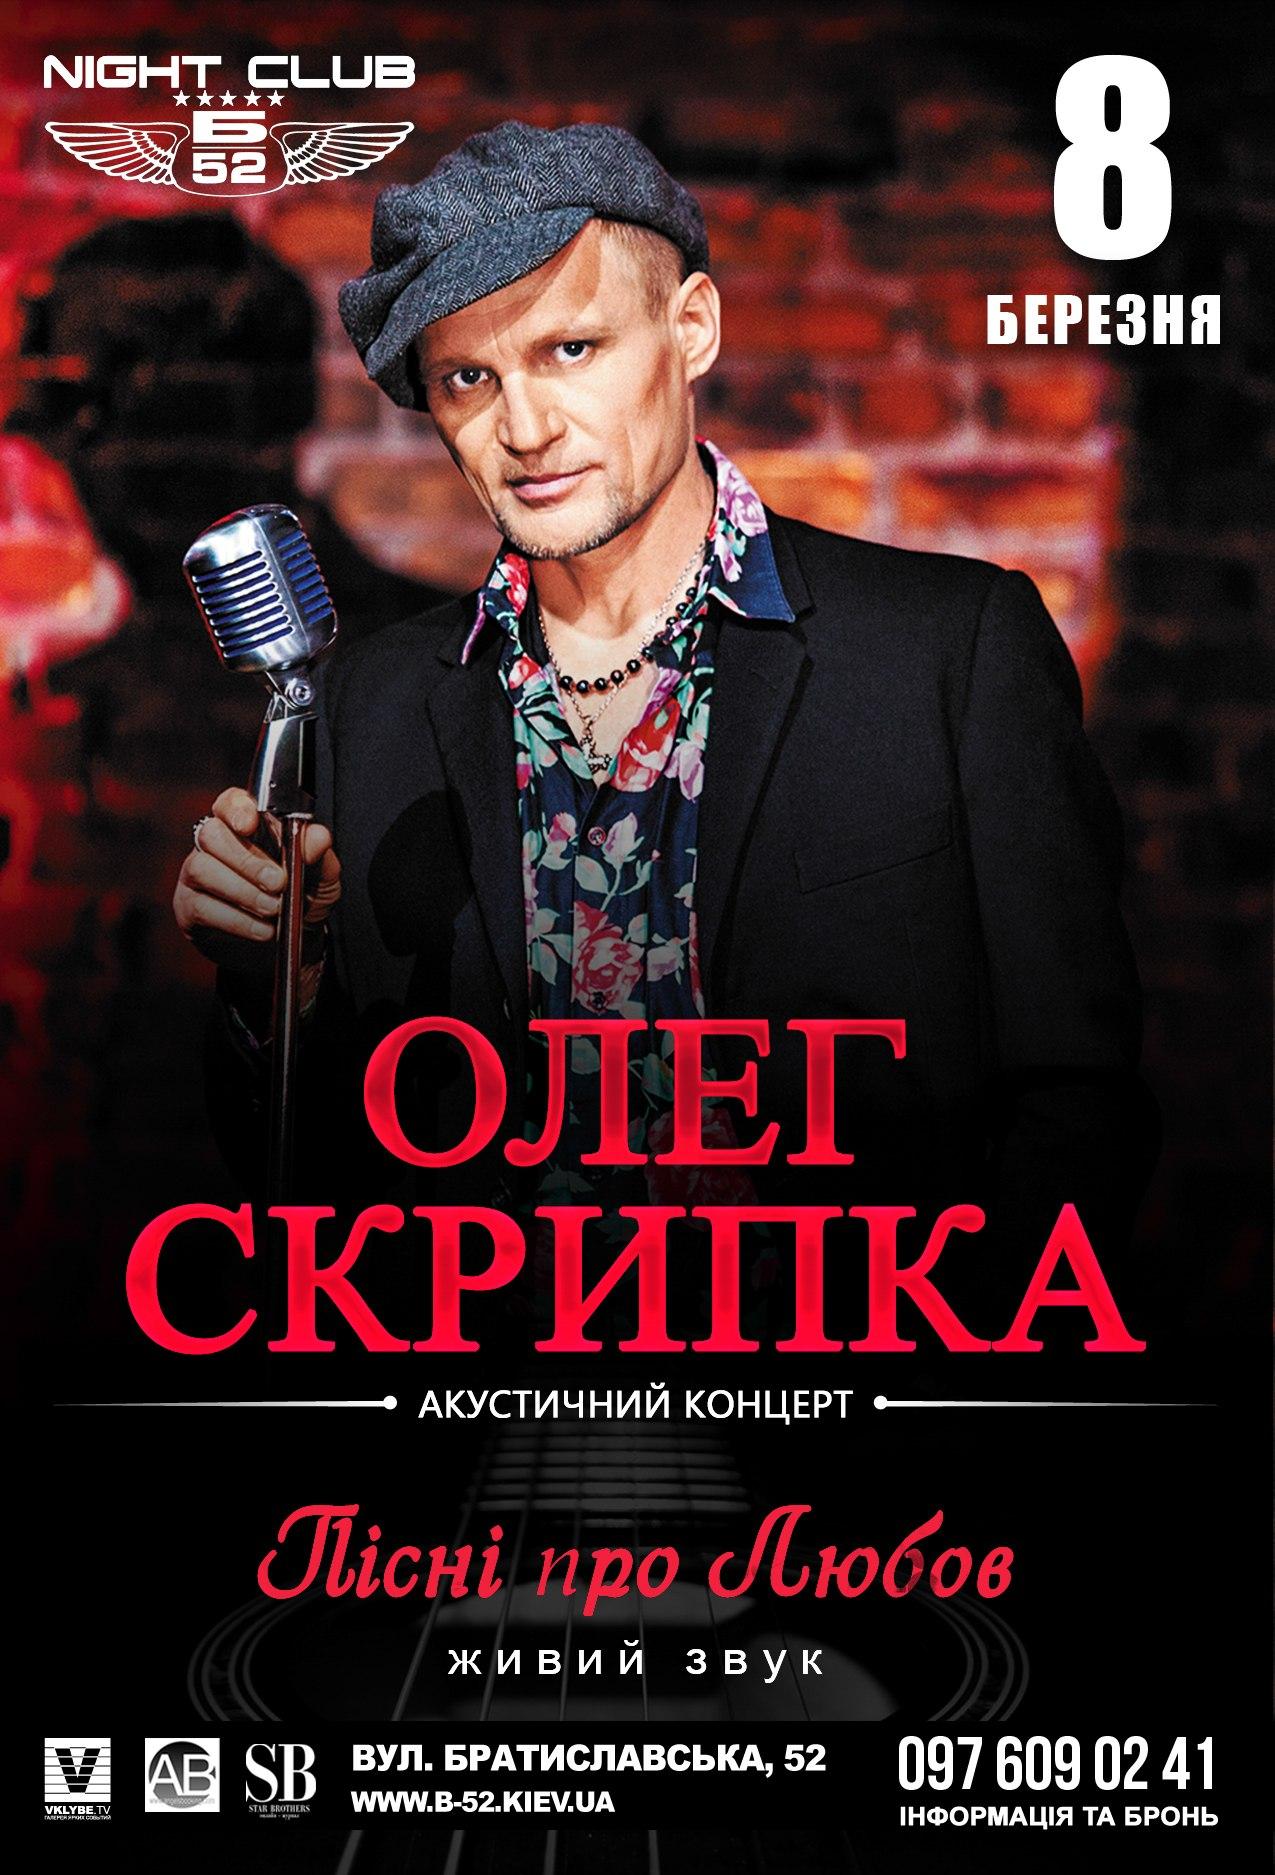 Афиша к концерту на 8 марта театр маяковского афиша на ноябрь 2015